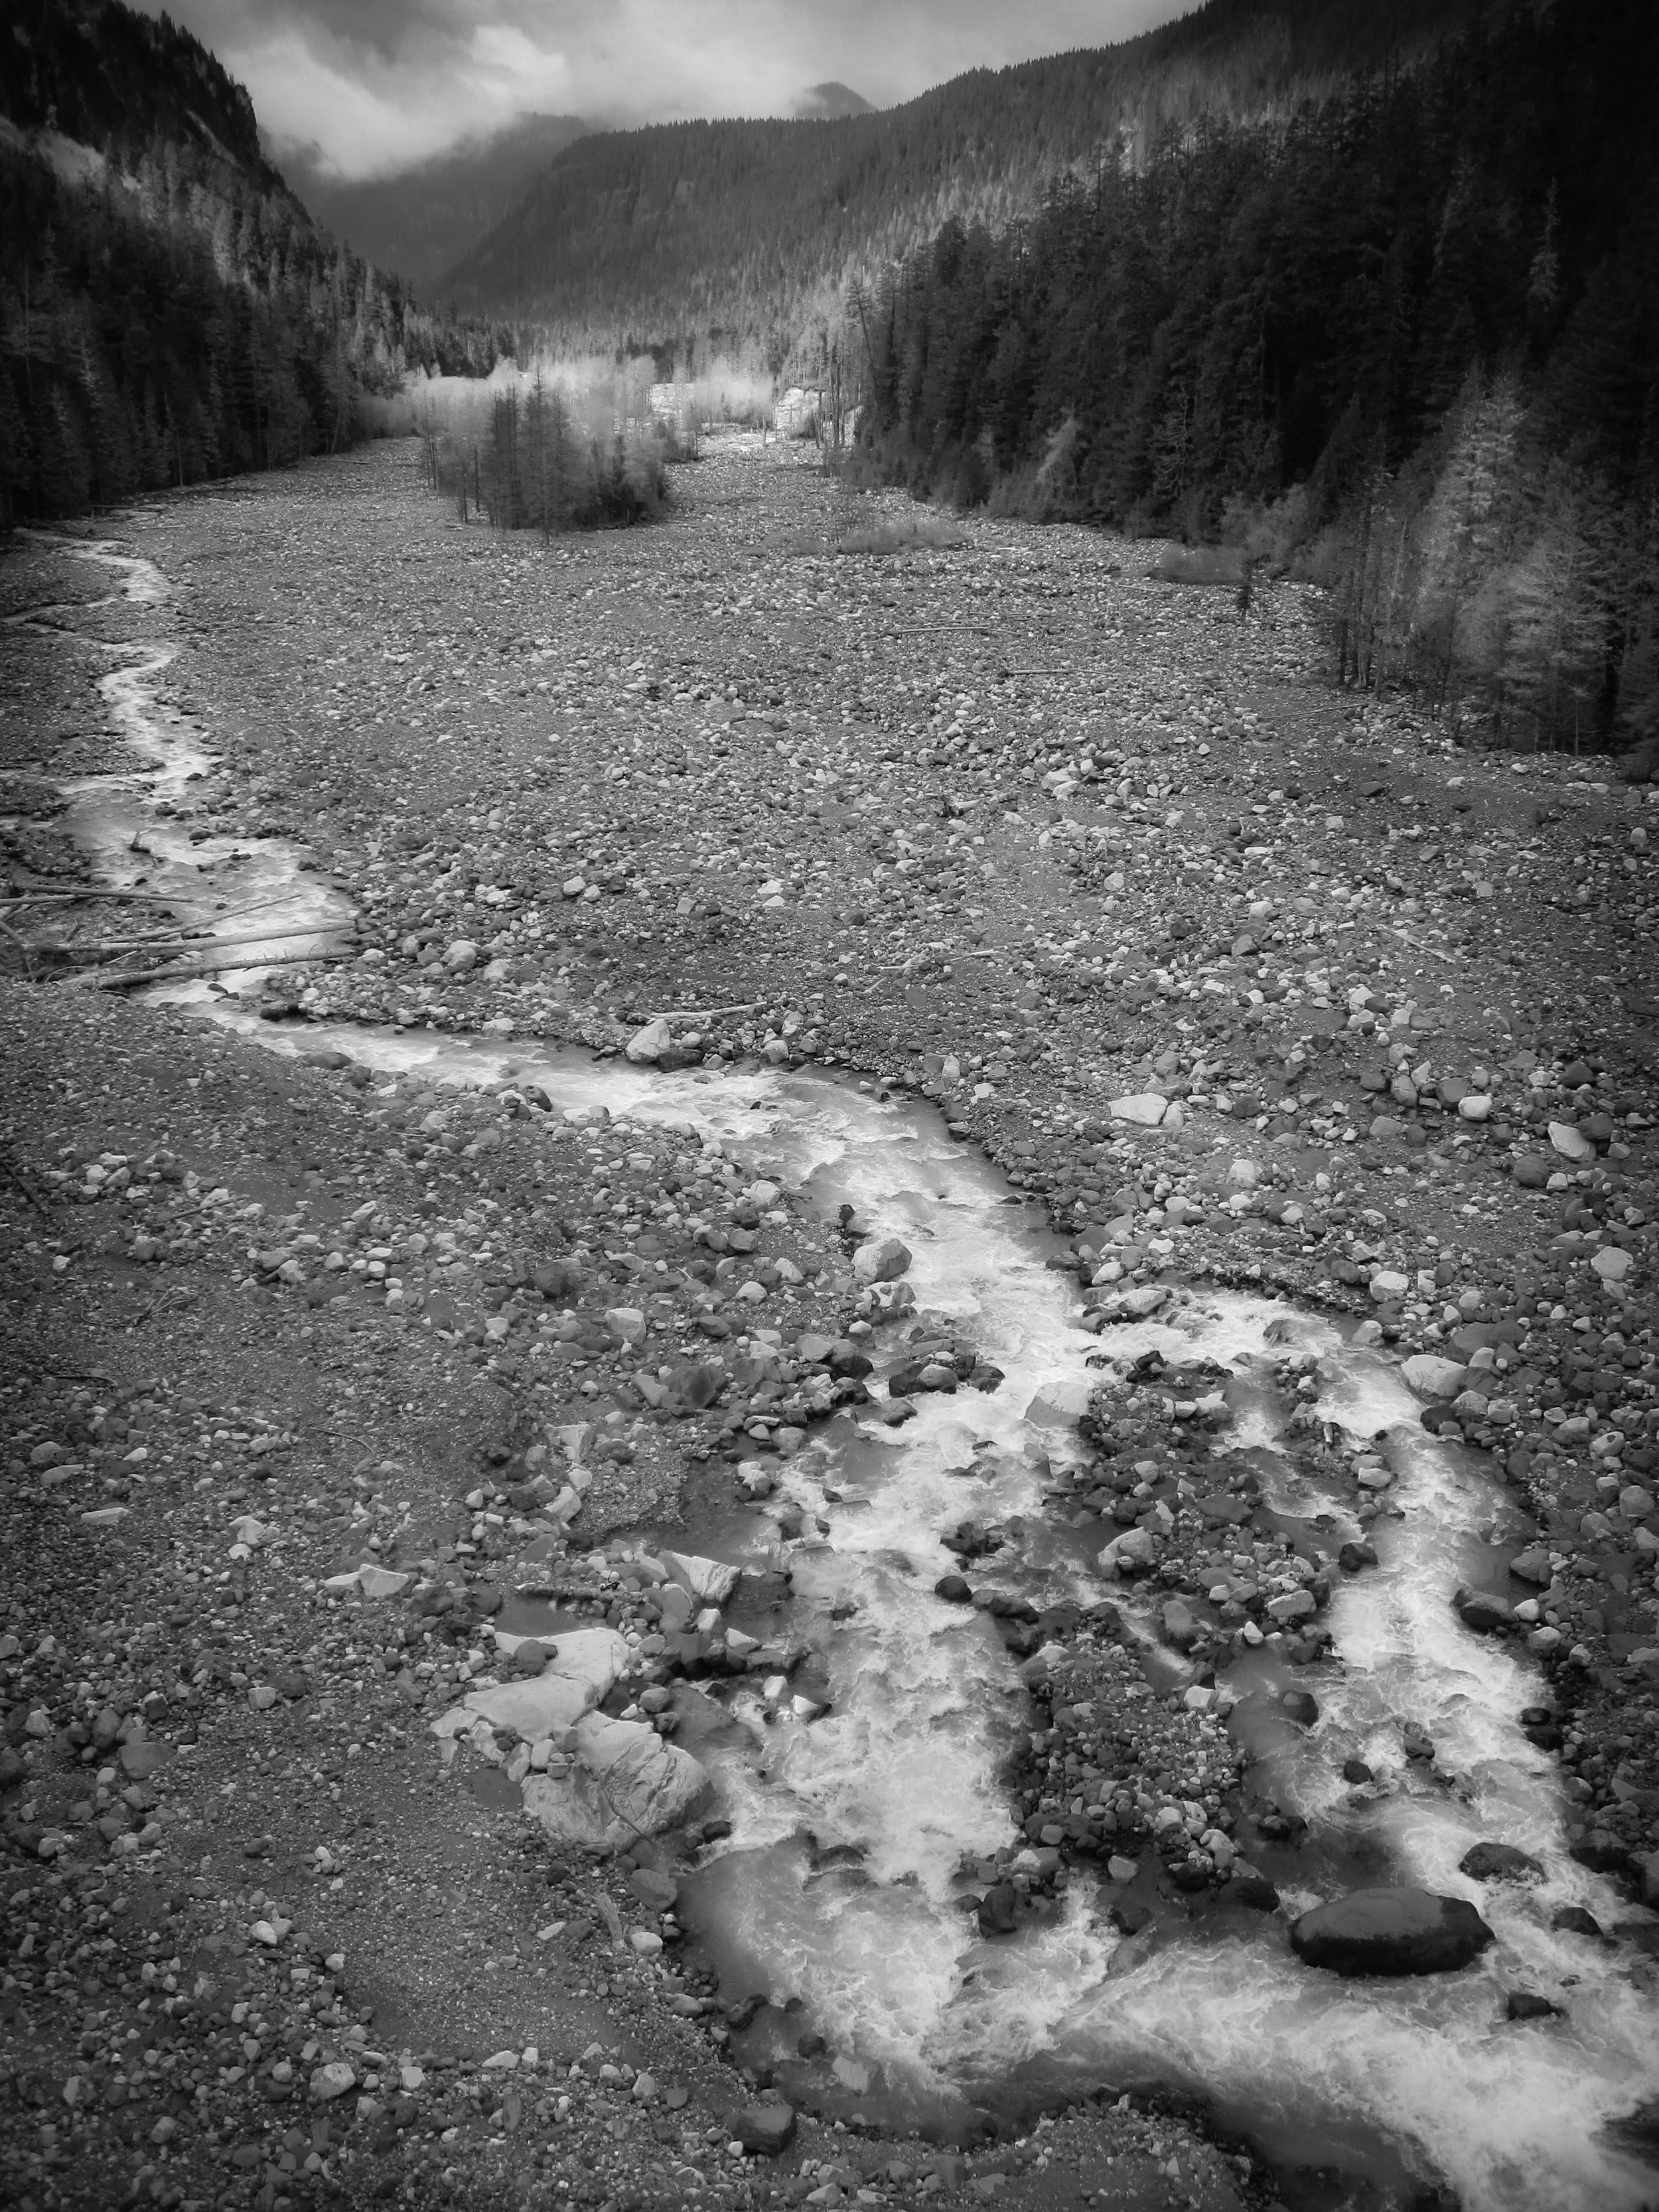 Mount Rainier N.P., WA